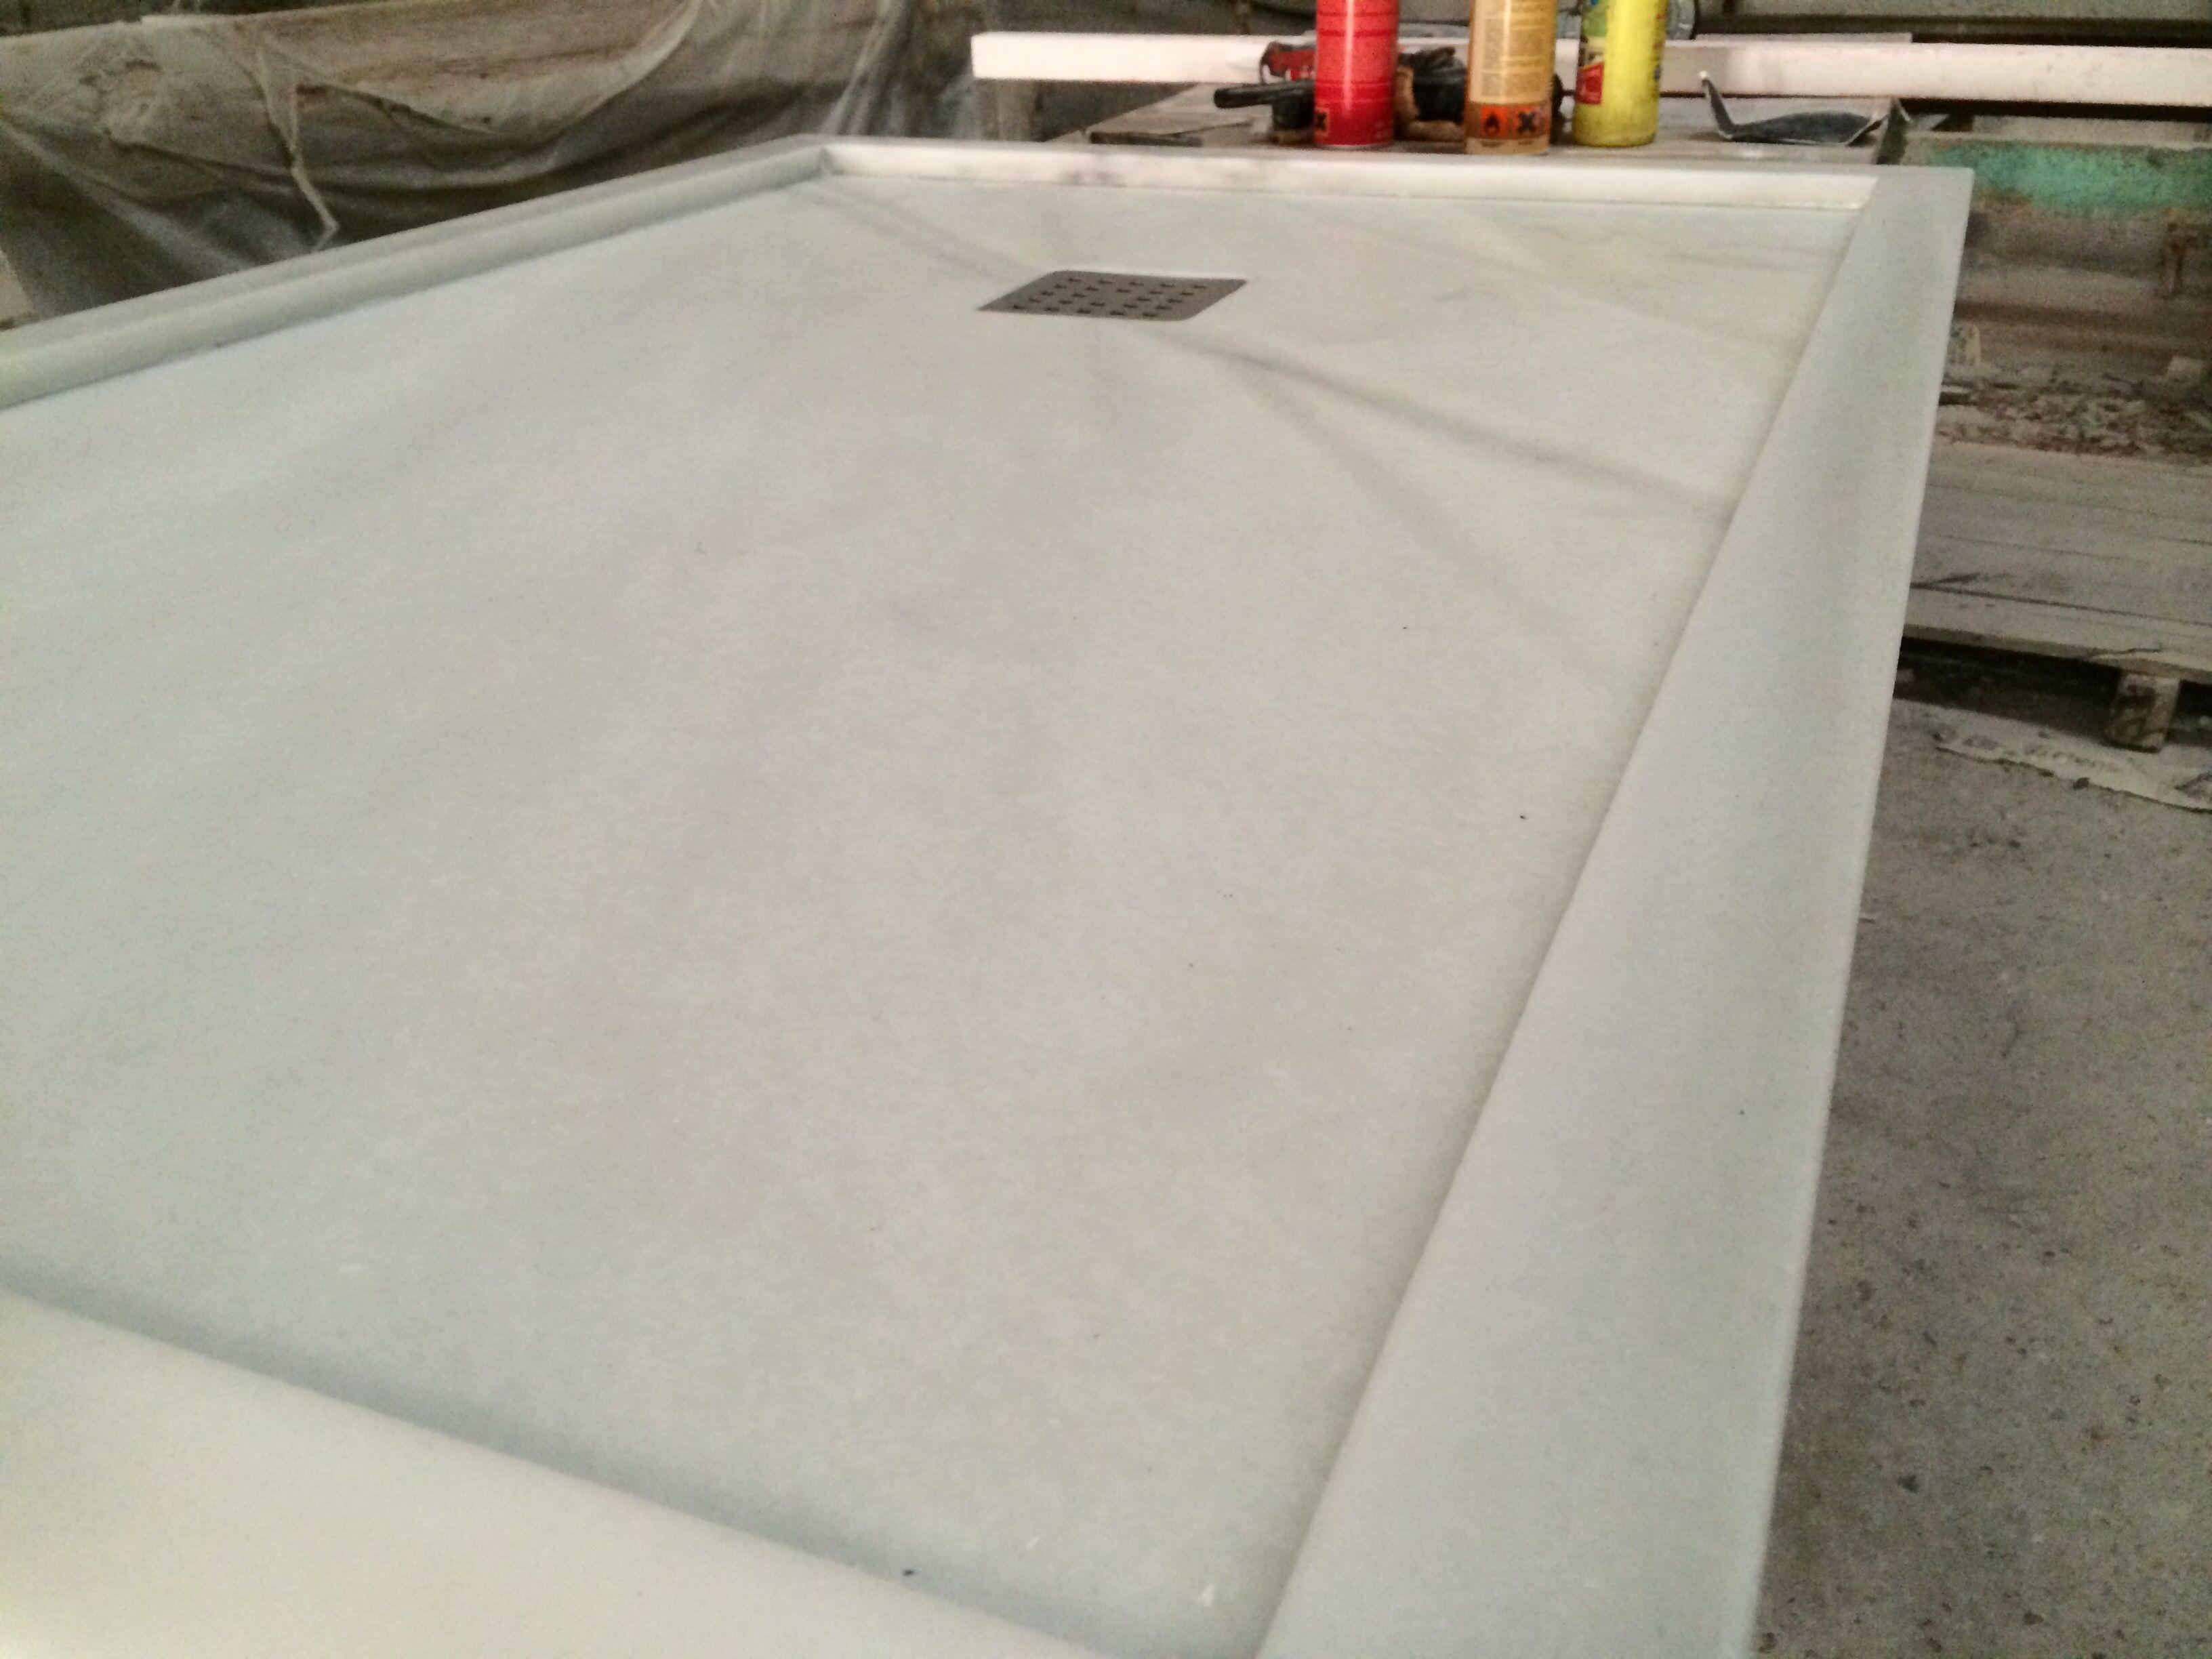 Platos de ducha en marmol natural for Marmol para ducha